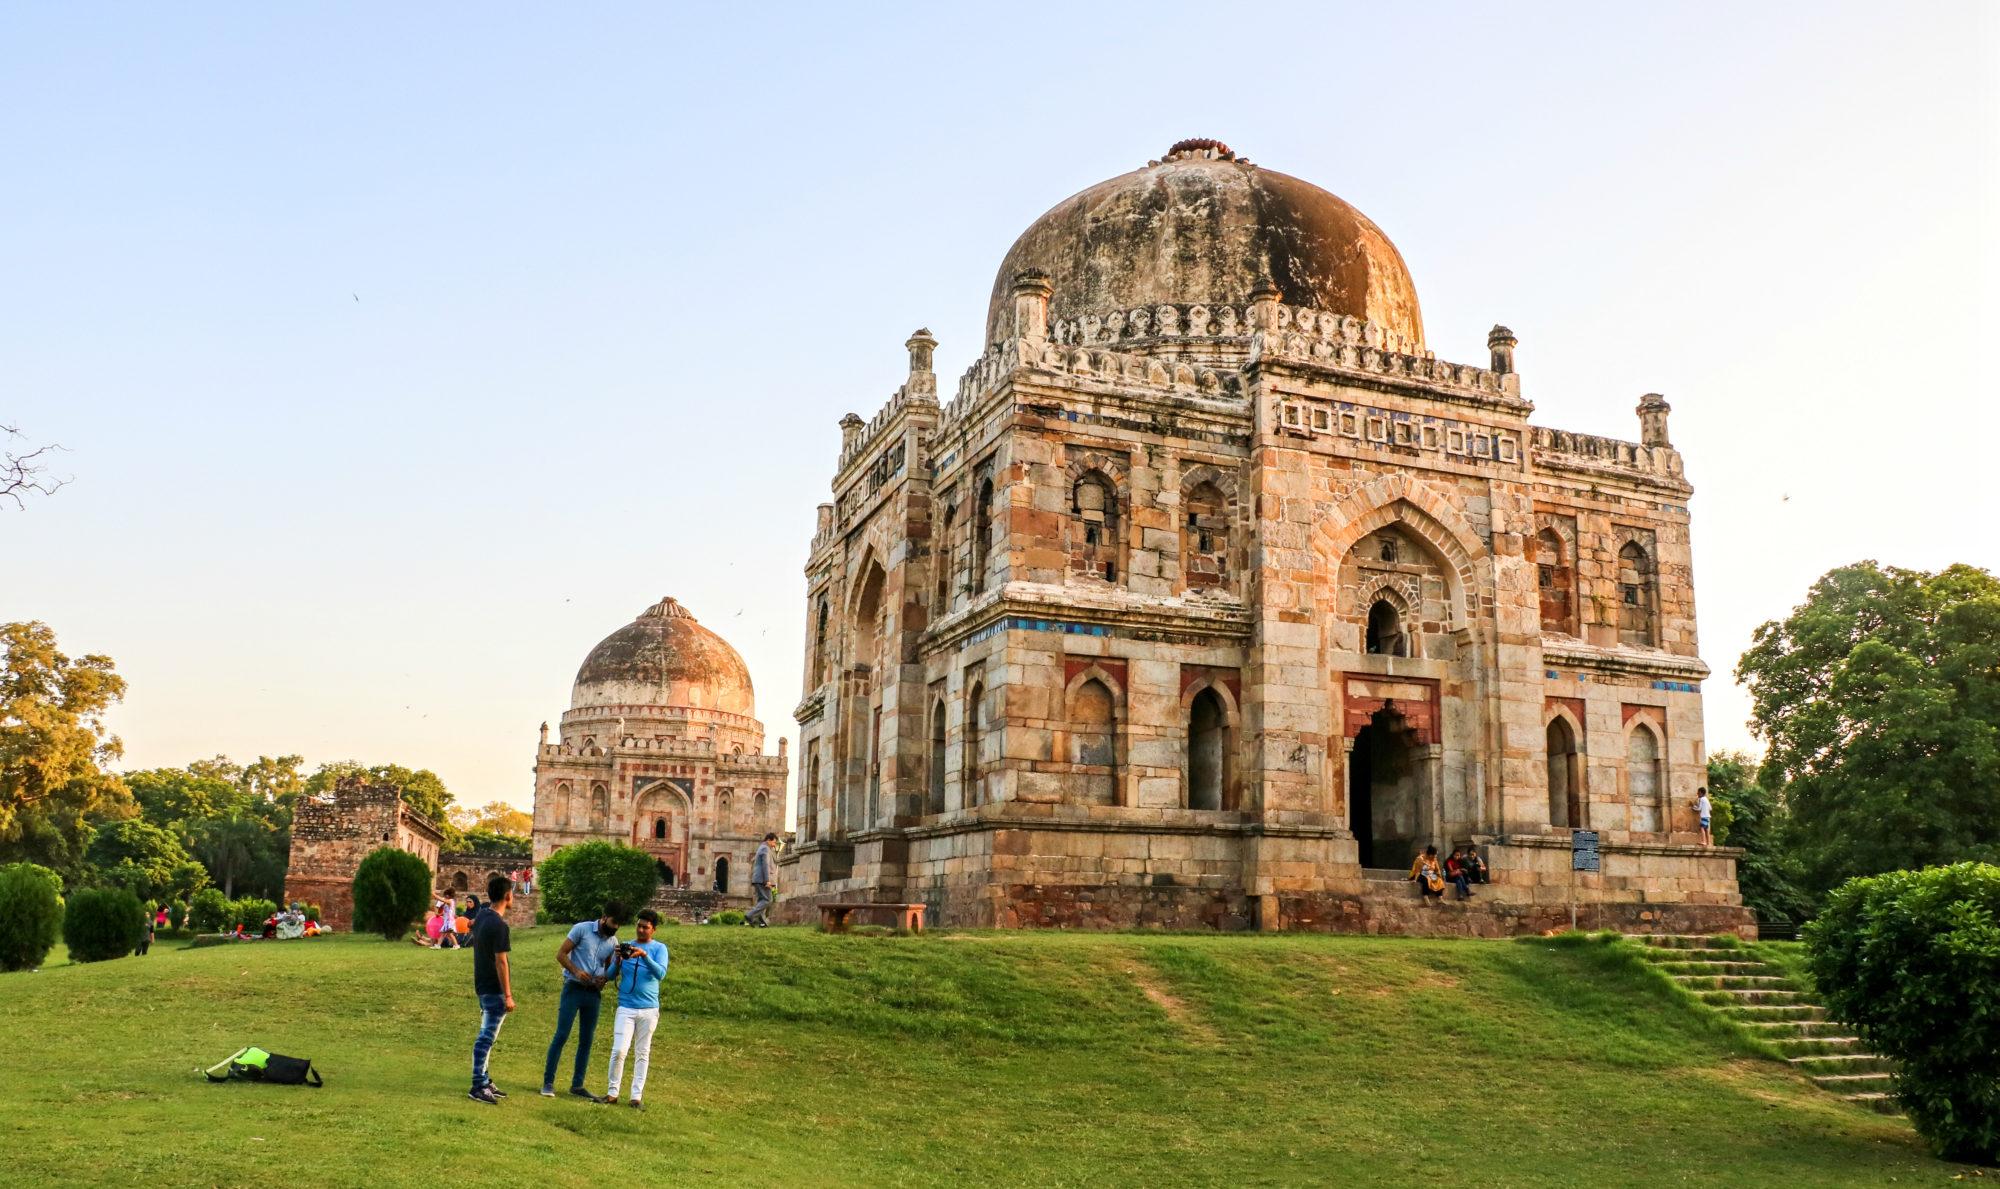 Delhi Lodi Gardens, India